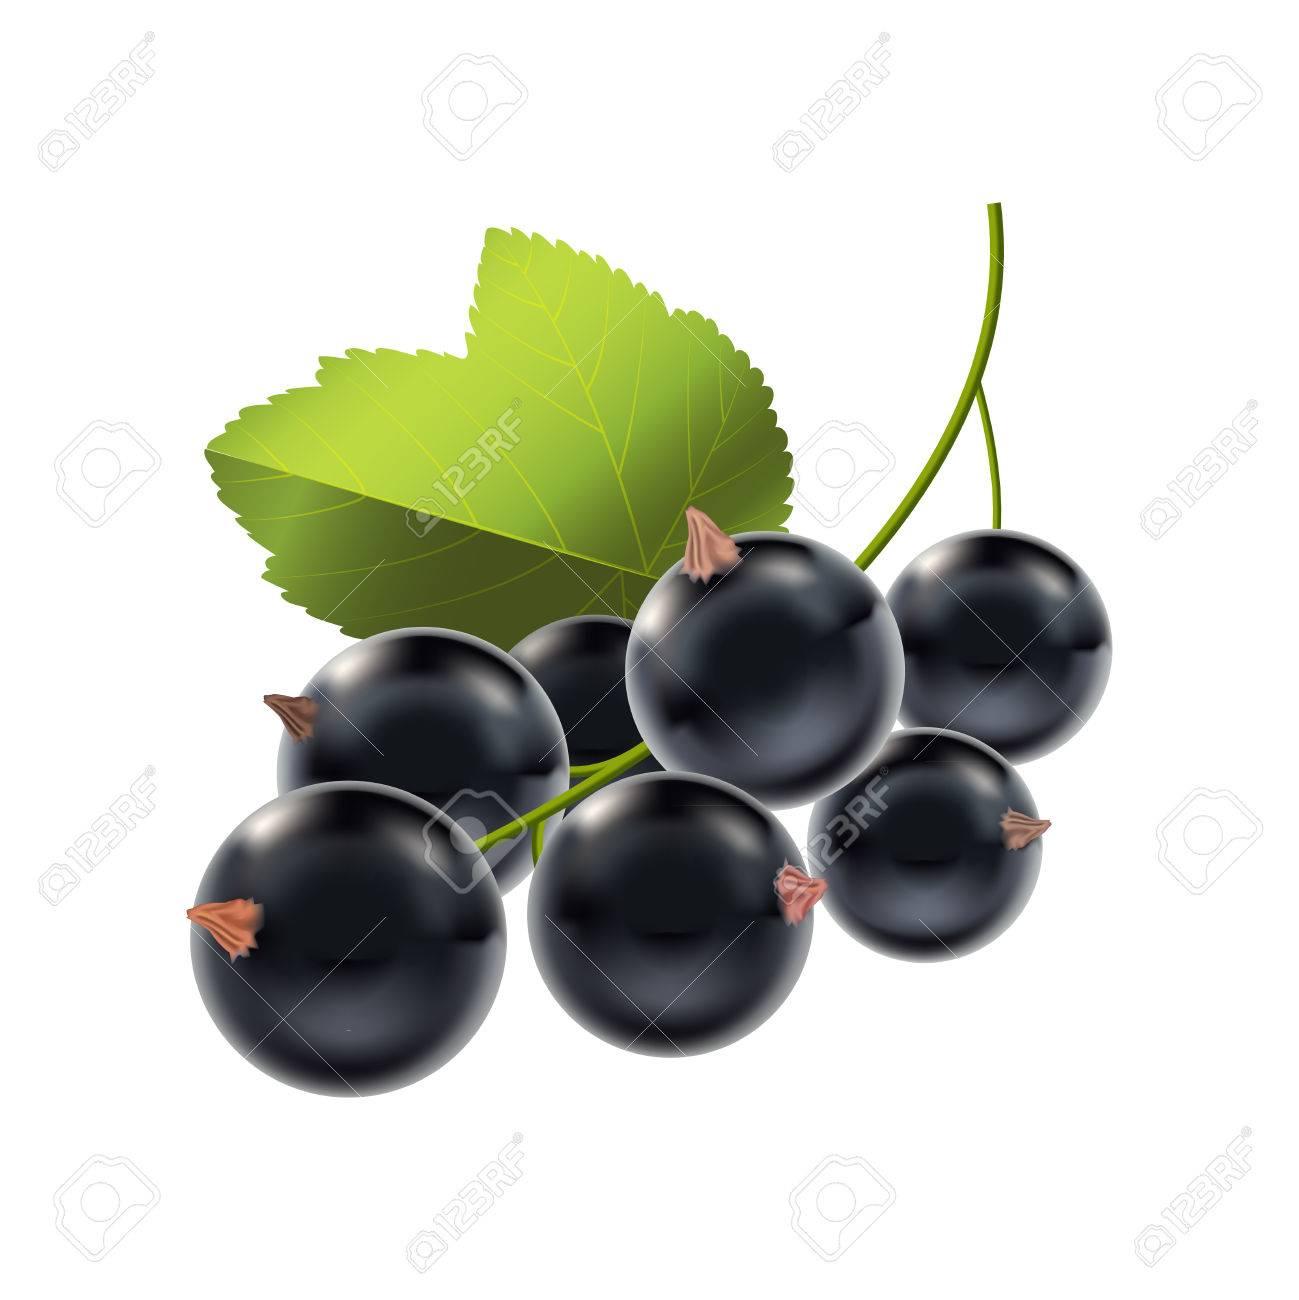 Realistic Detailed Ripe Black Berry Currant Natural Seasonal